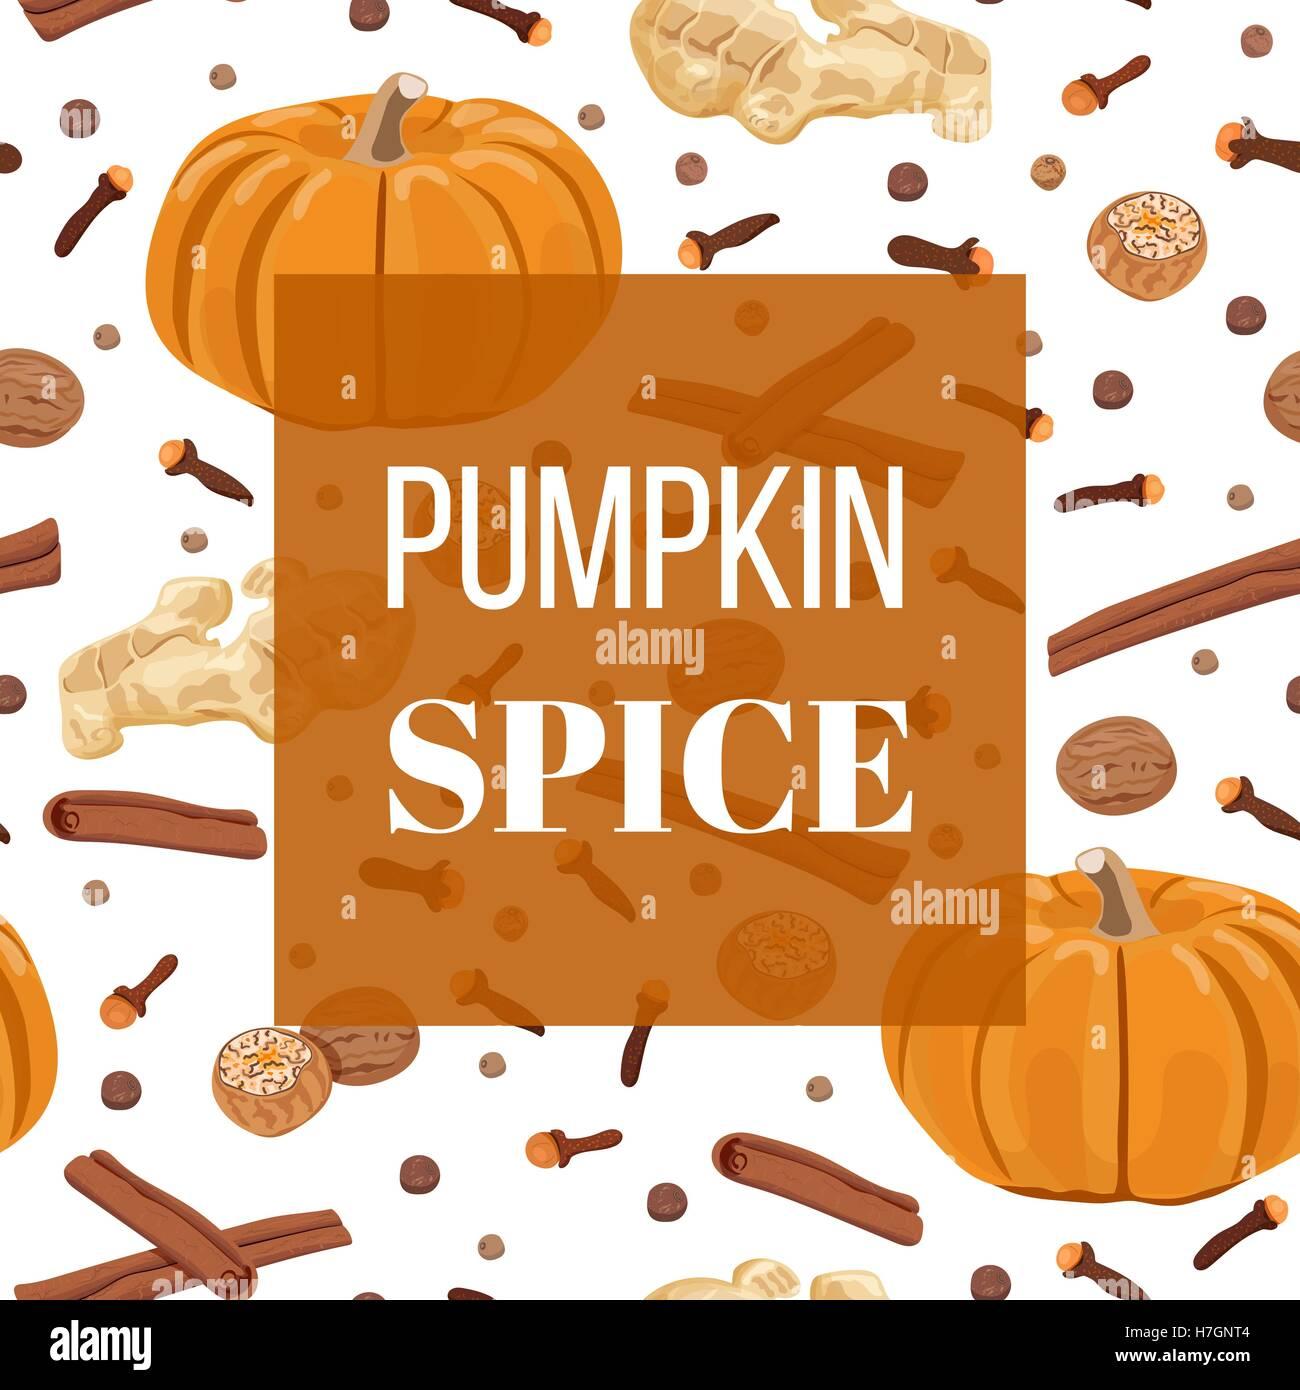 Pumpkin Spice Seamless Pattern Vector Set Nutmeg Ginger Cloves Cinnamon Allspice Square Label For Food Design P